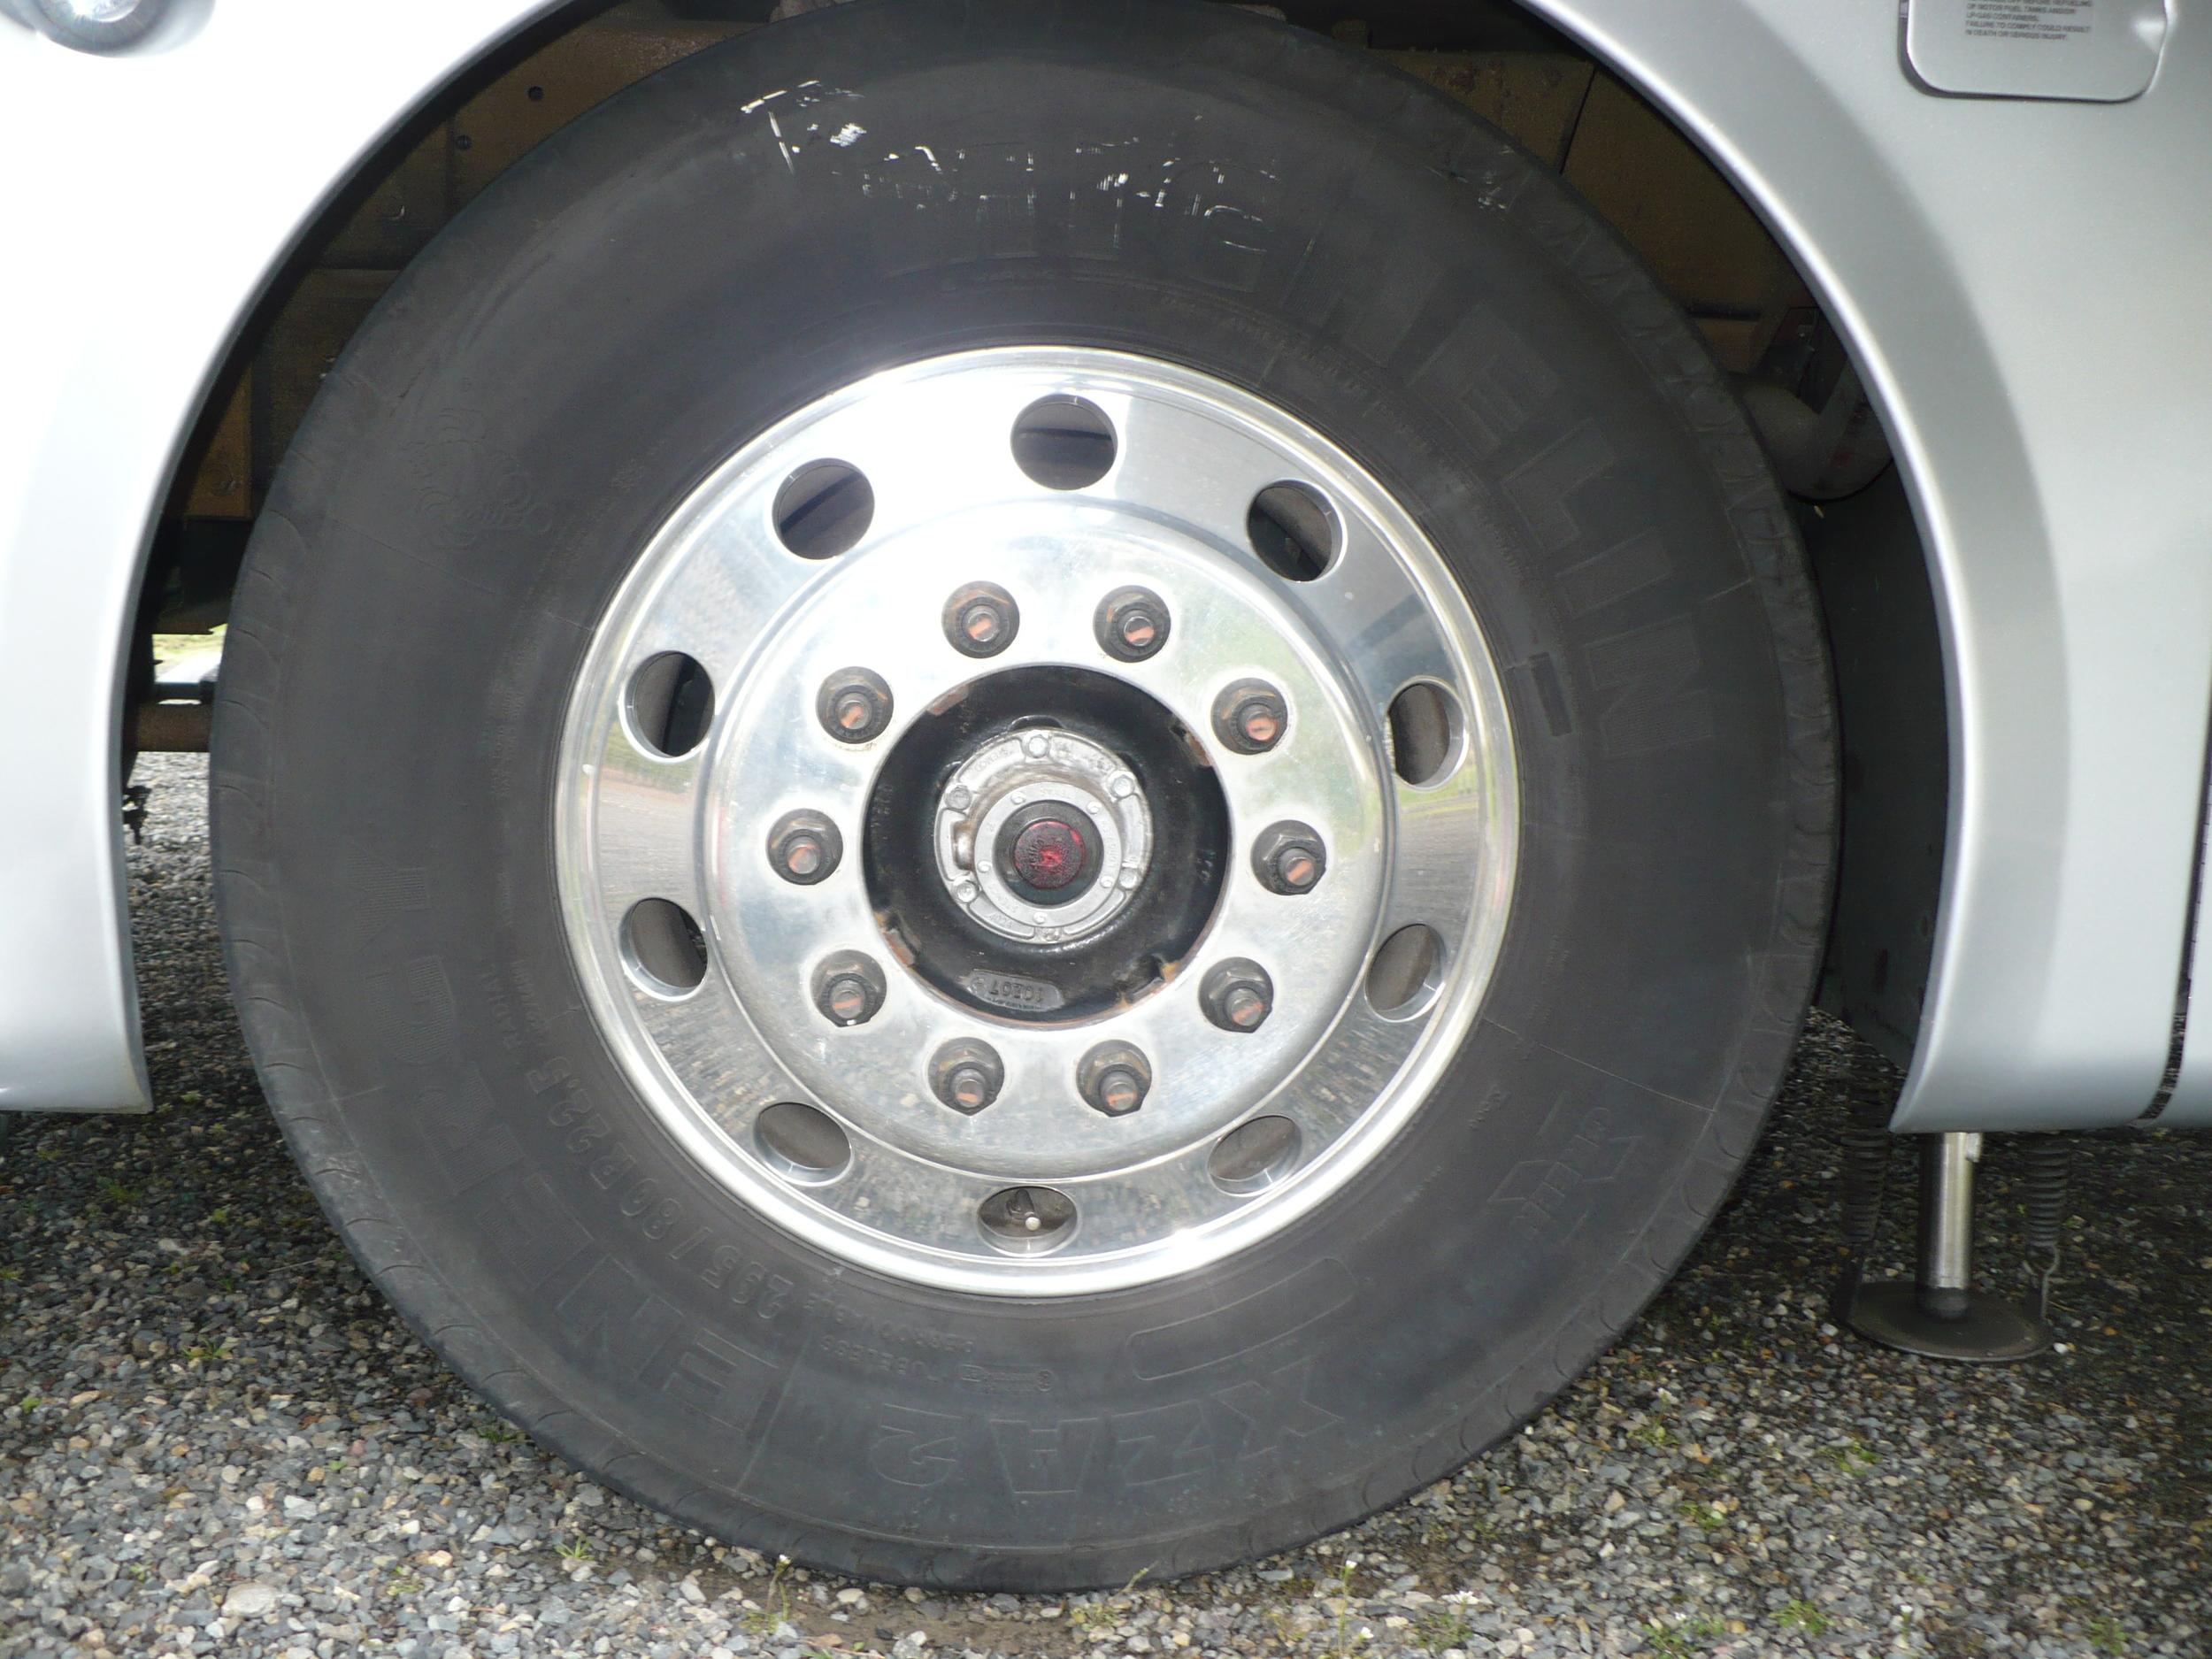 20 - COACH ALLEGRO BUS - Front wheel antes de pulir.JPG